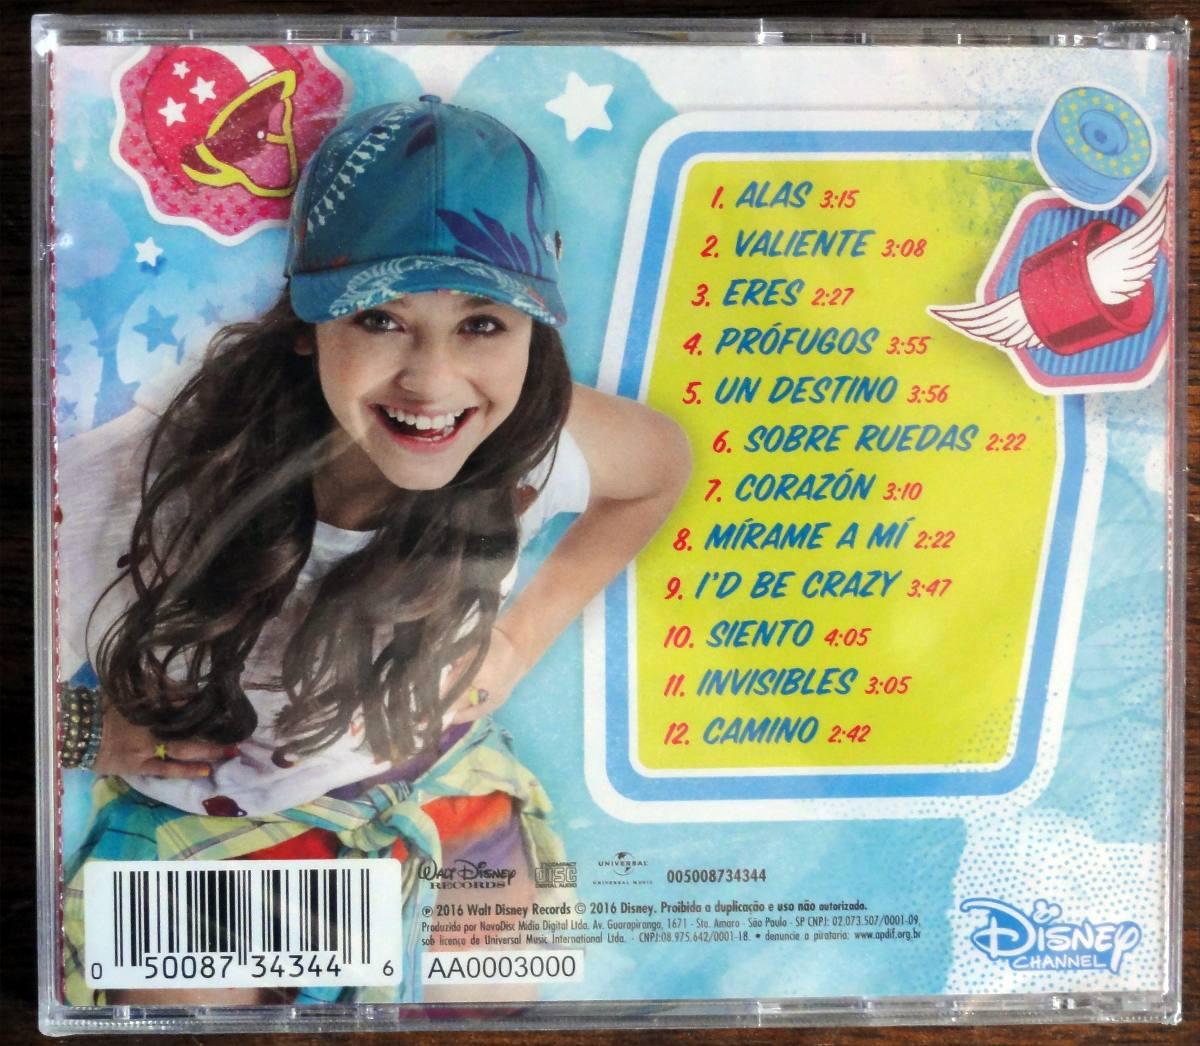 d2daf4cd0413c Cd Sou Luna - Trilha Sonora Disney - Original - Lacrado!! - R  25,00 ...